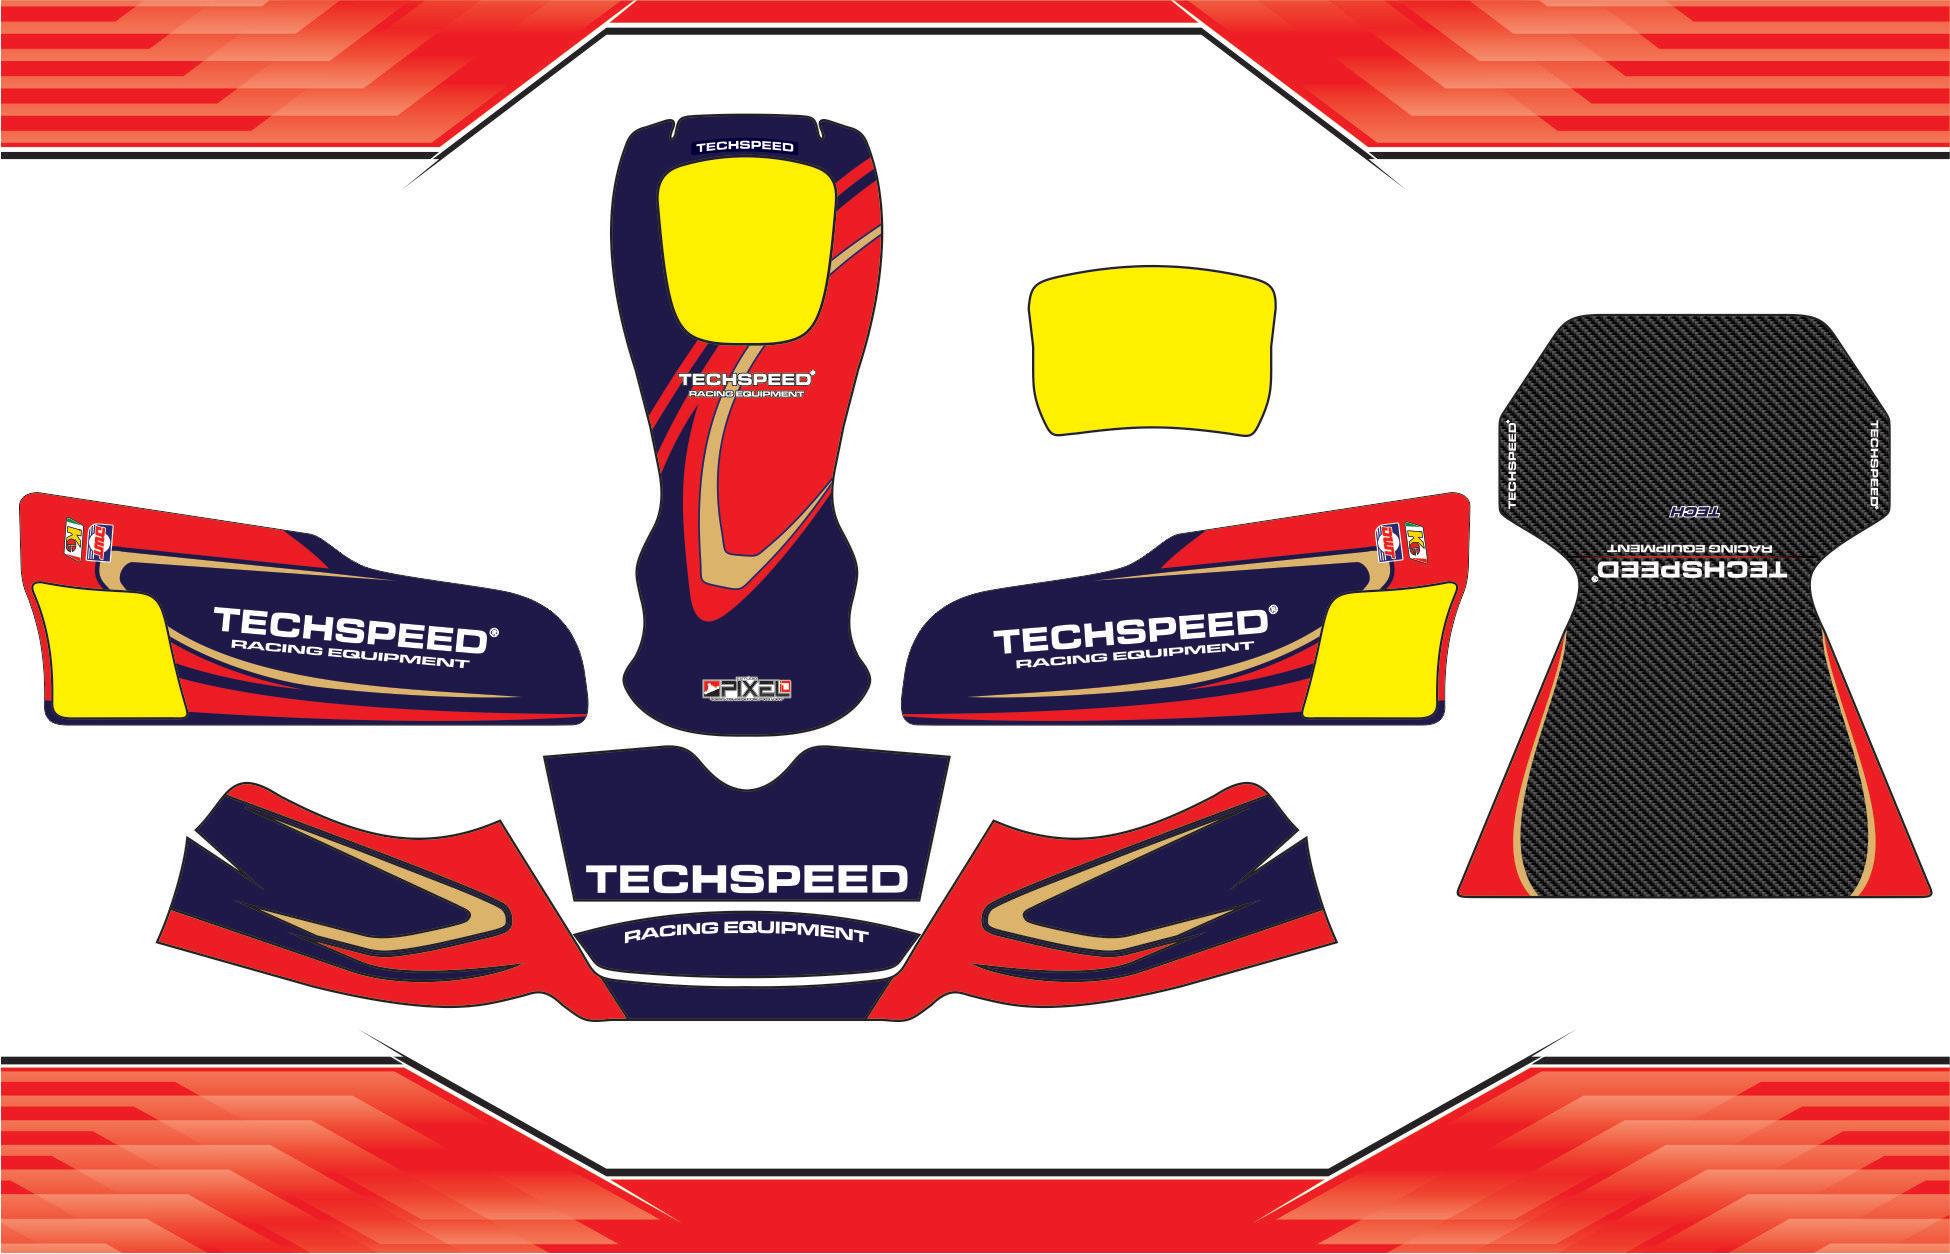 Kit Adesivos Para Kart Resinado Techspeed 2016 C